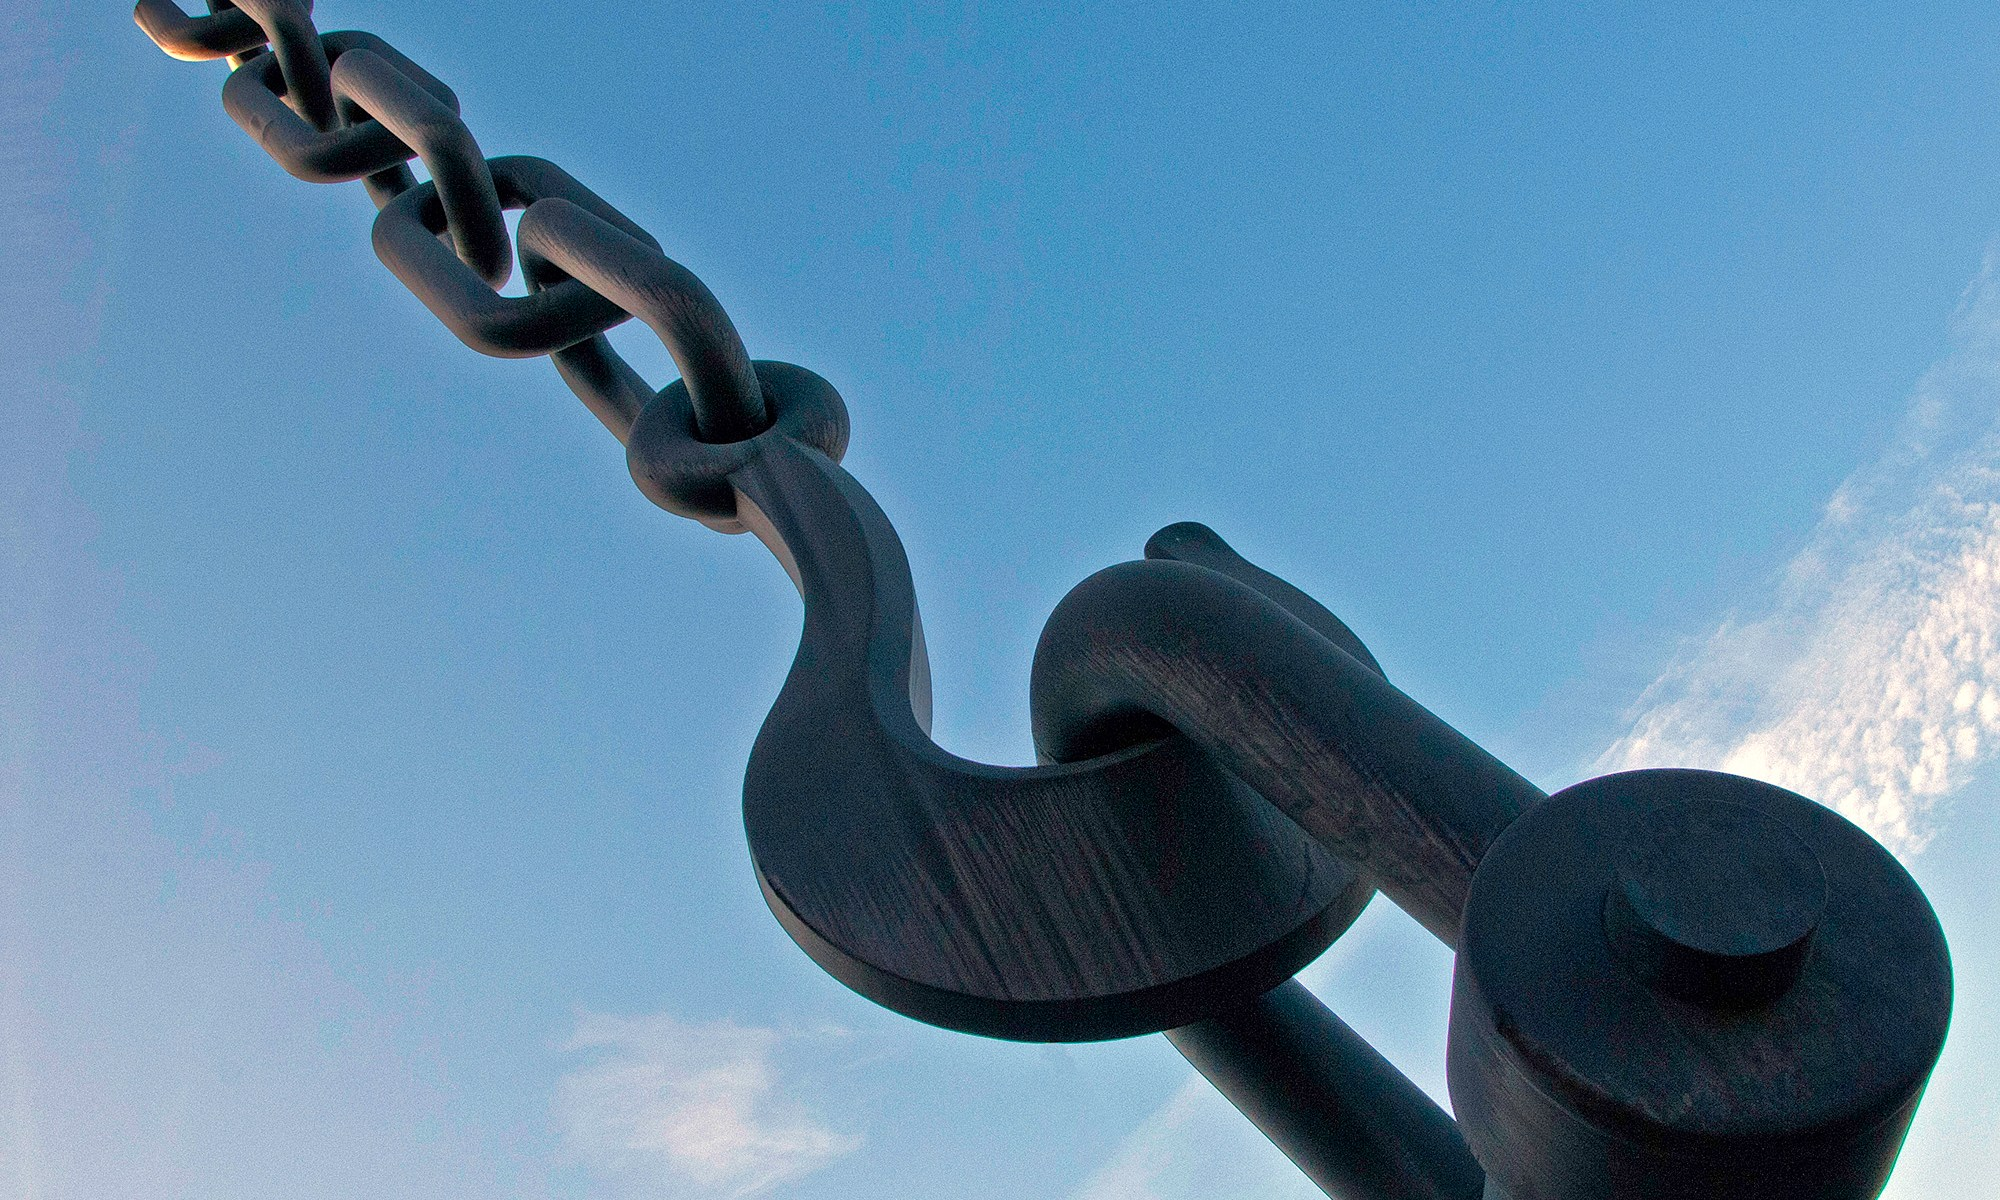 Chain at Trafford Park